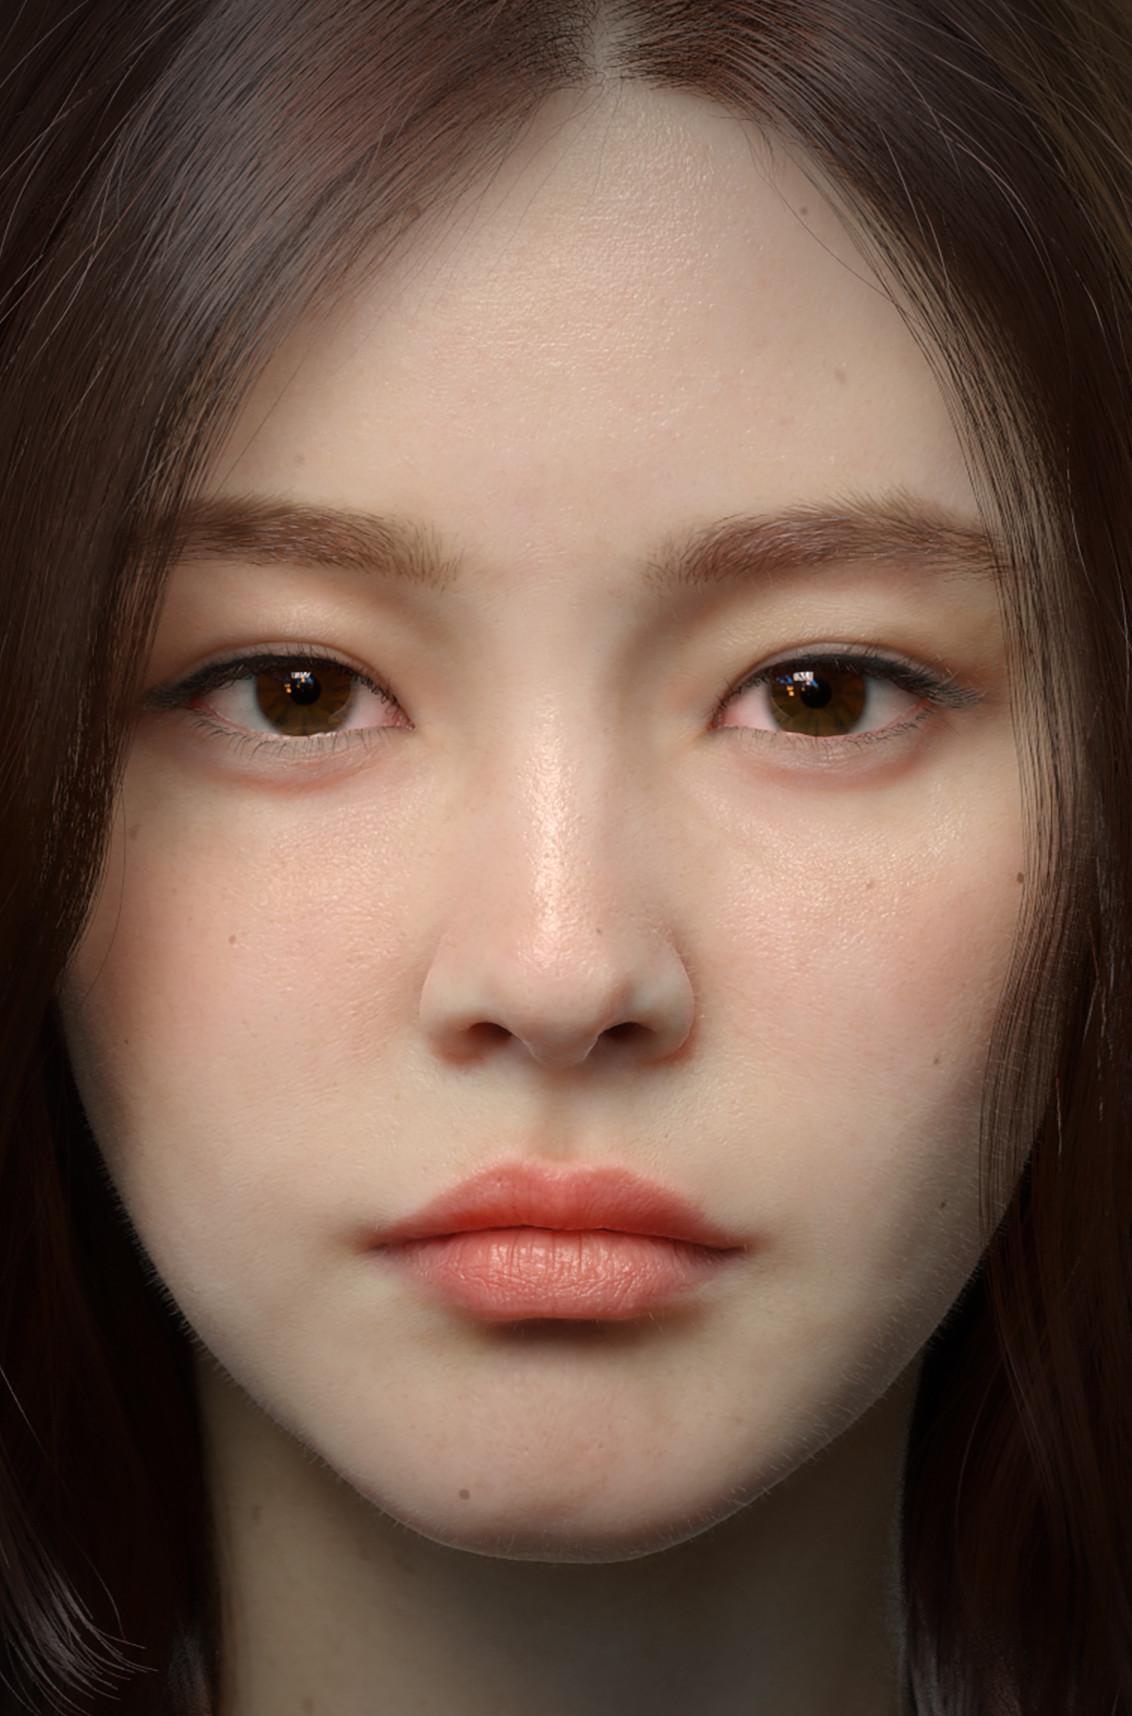 2019 woman by Seok Yun Jang